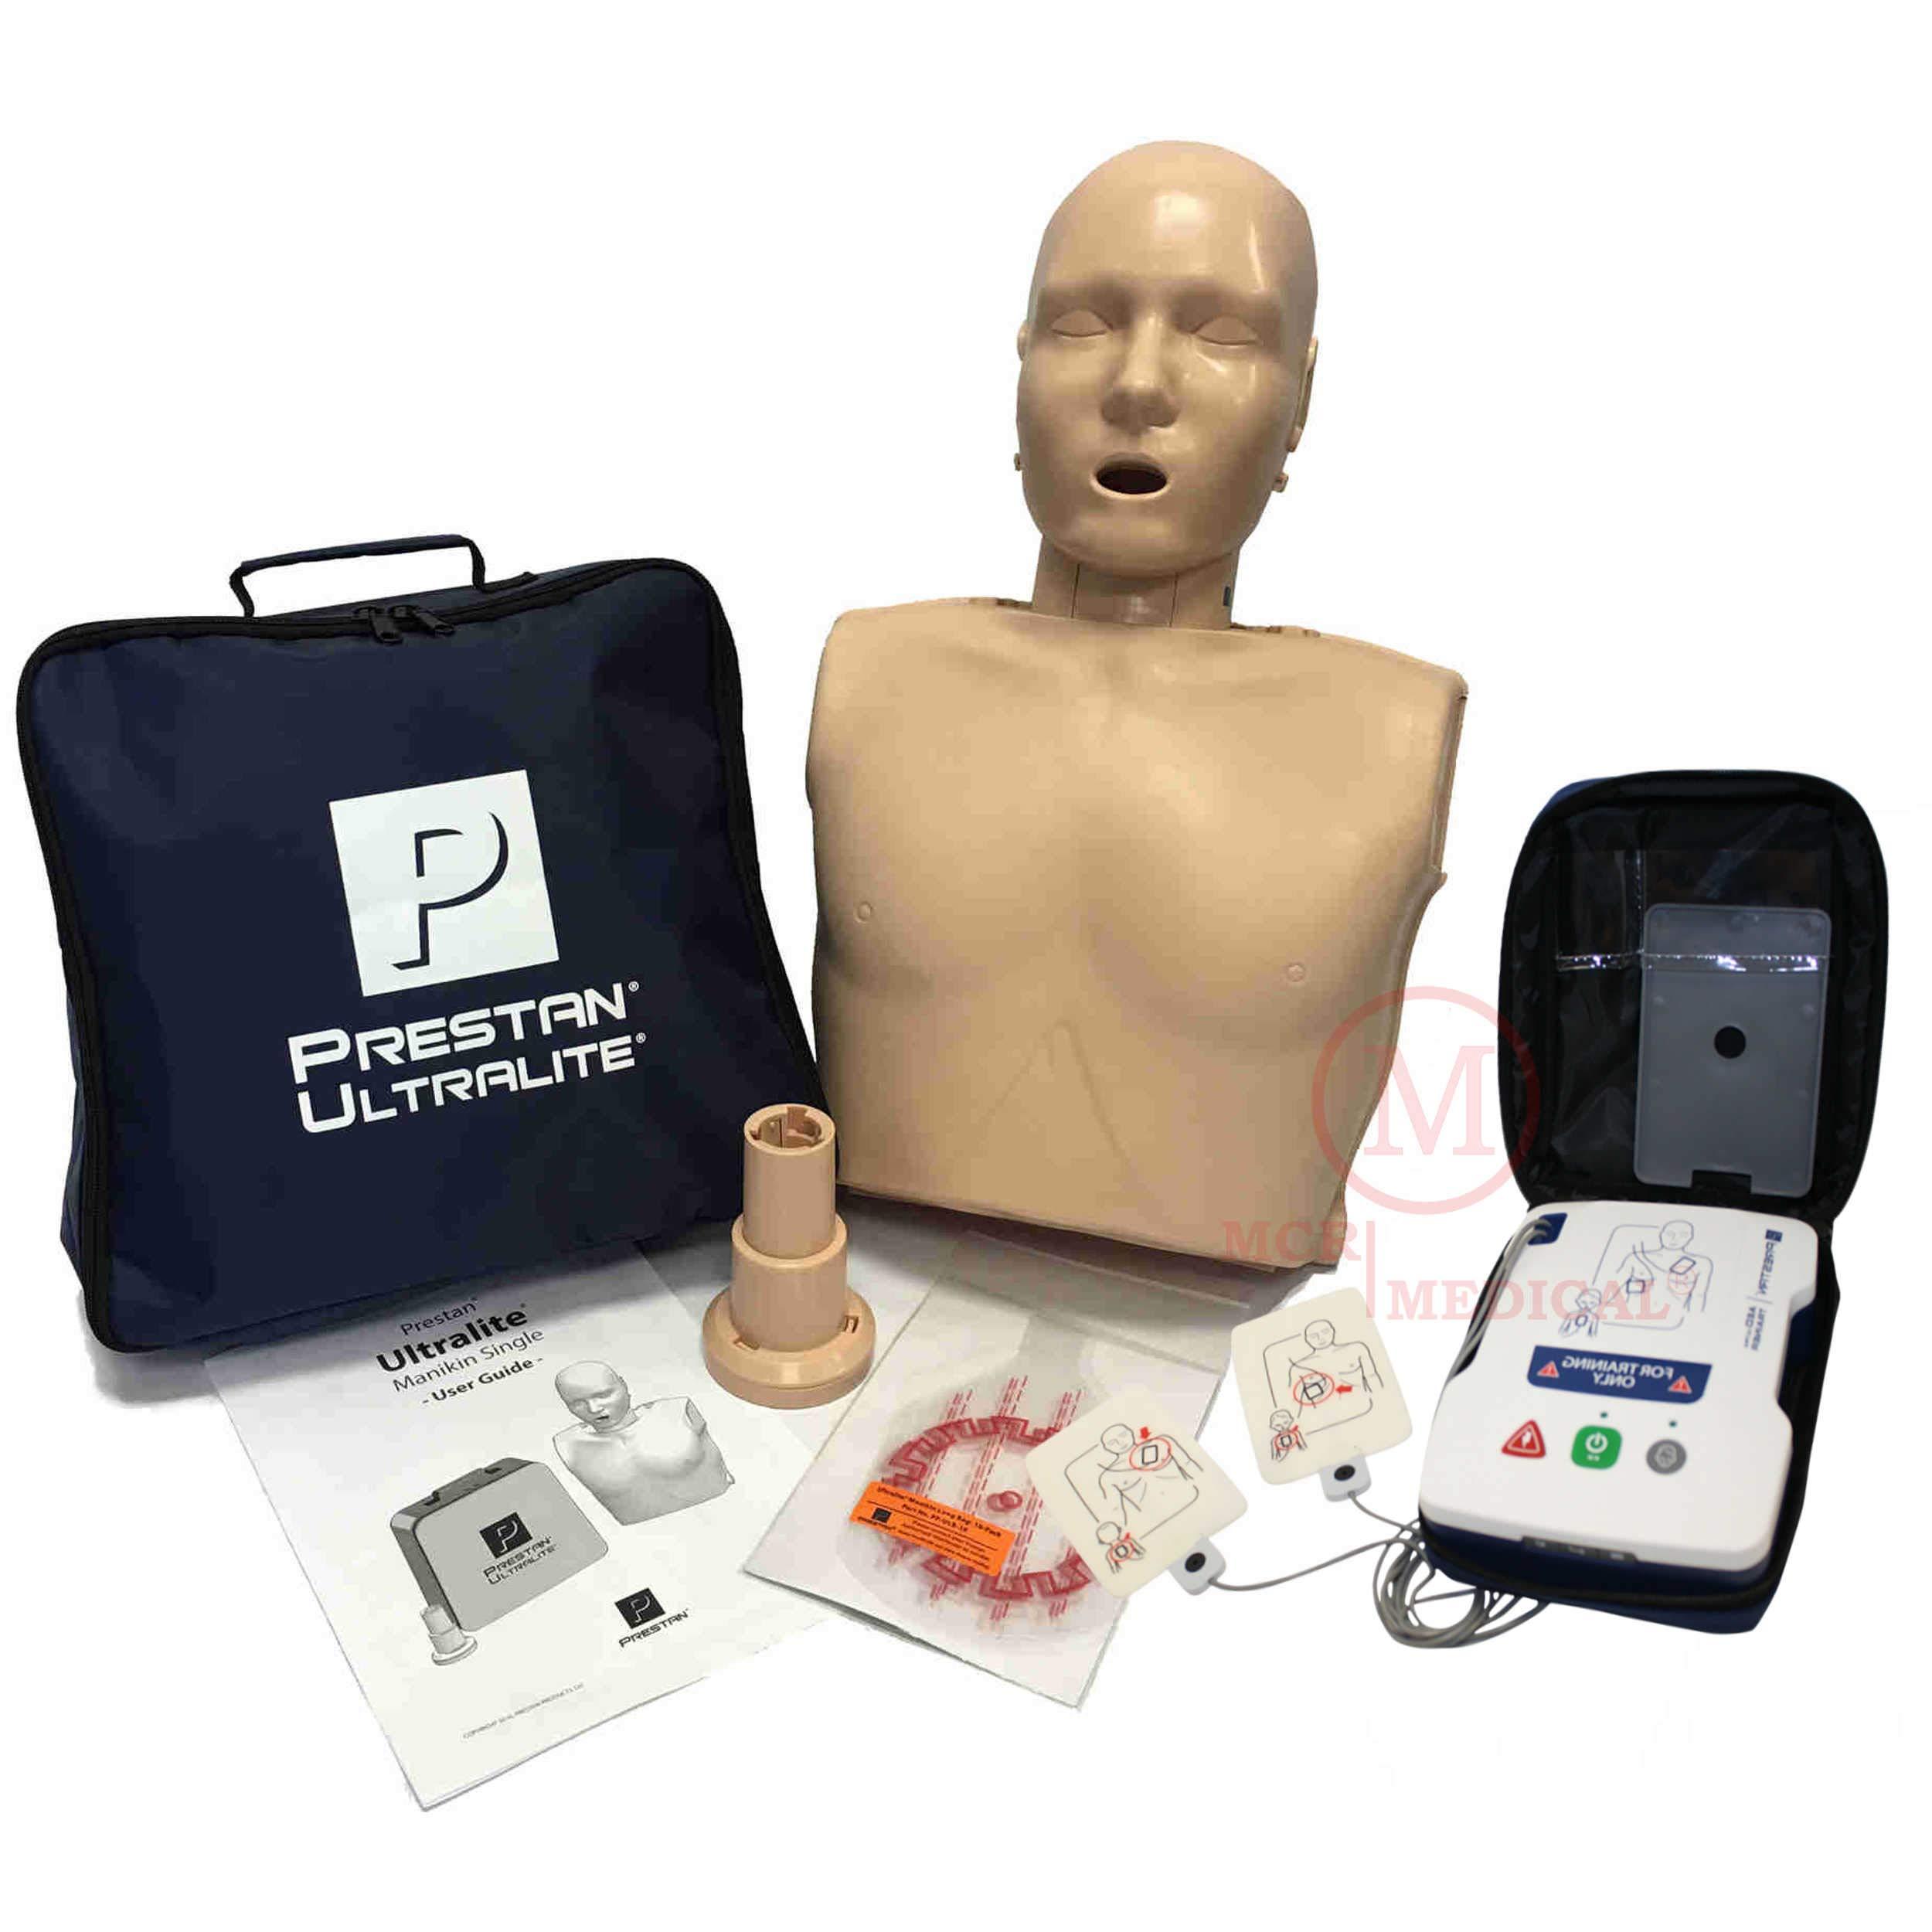 Basic CPR Training Kit w Prestan Ultralite CPR Manikin, AED UltraTrainer, MCR Accessories